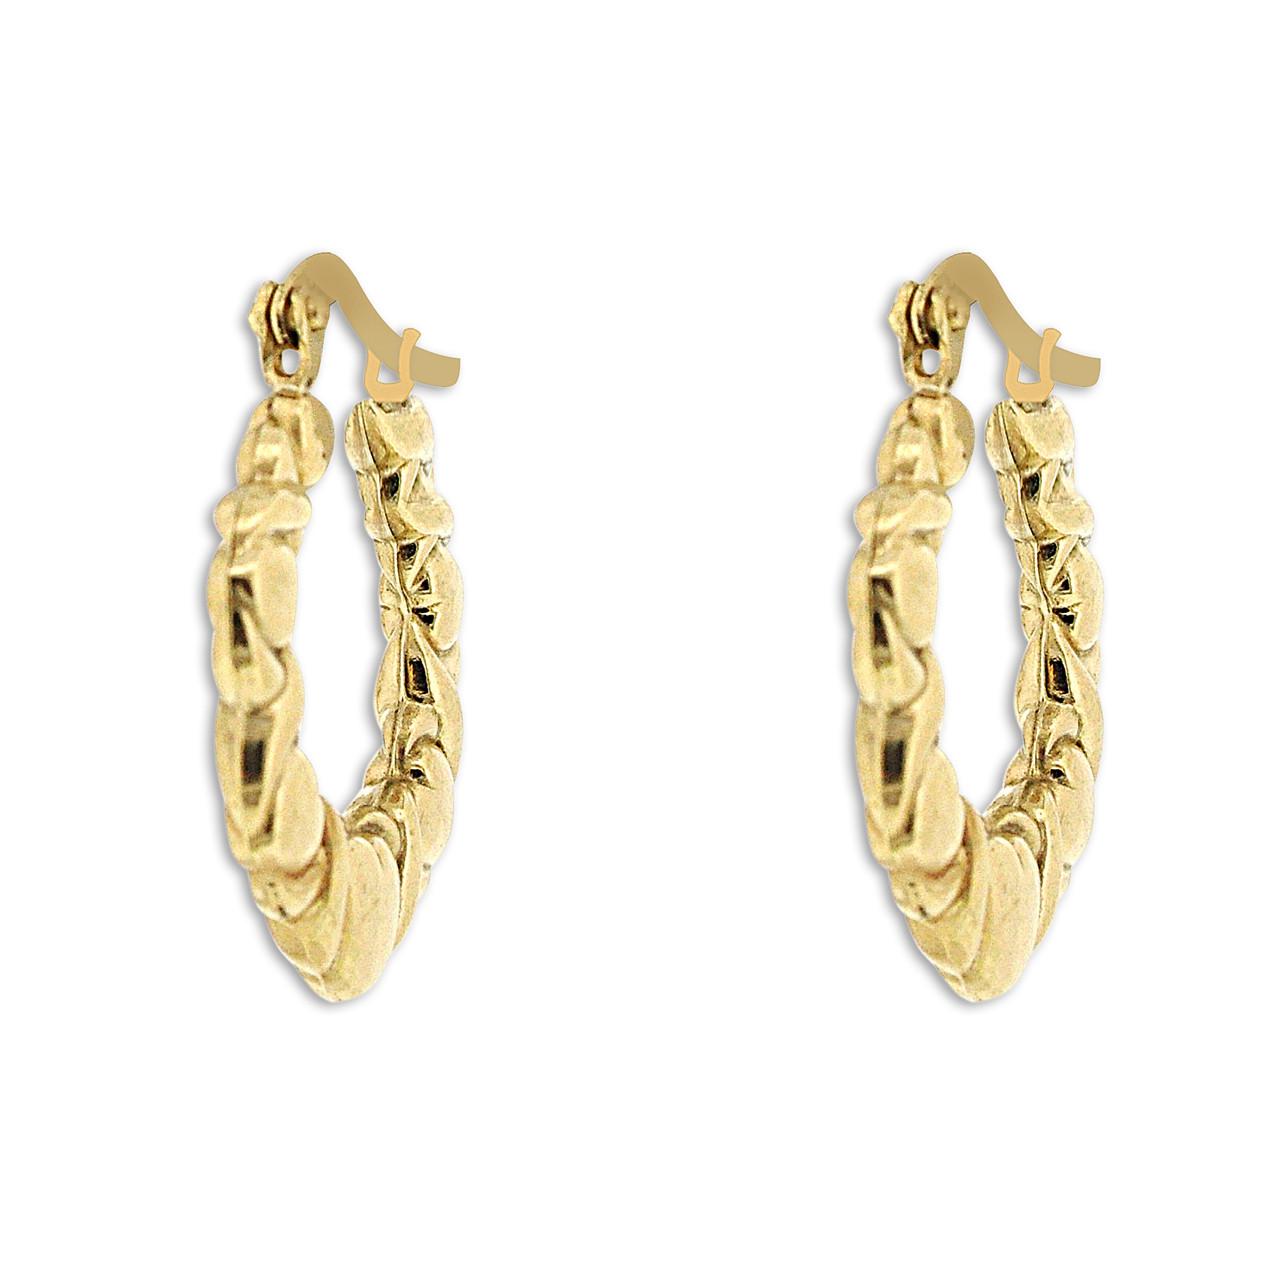 fb0475c860d 14K Yellow Gold Hugs and Kisses Hoop Earrings 49000159